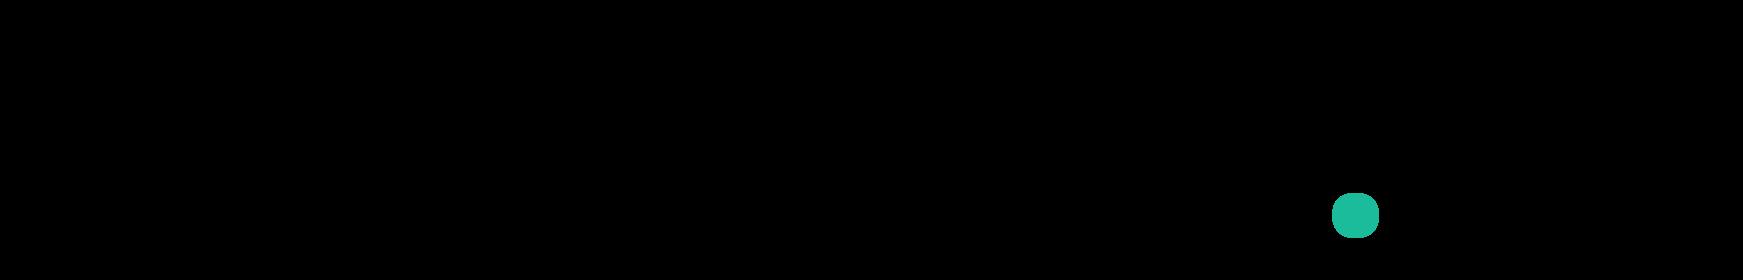 logo_5efb40d8947c7